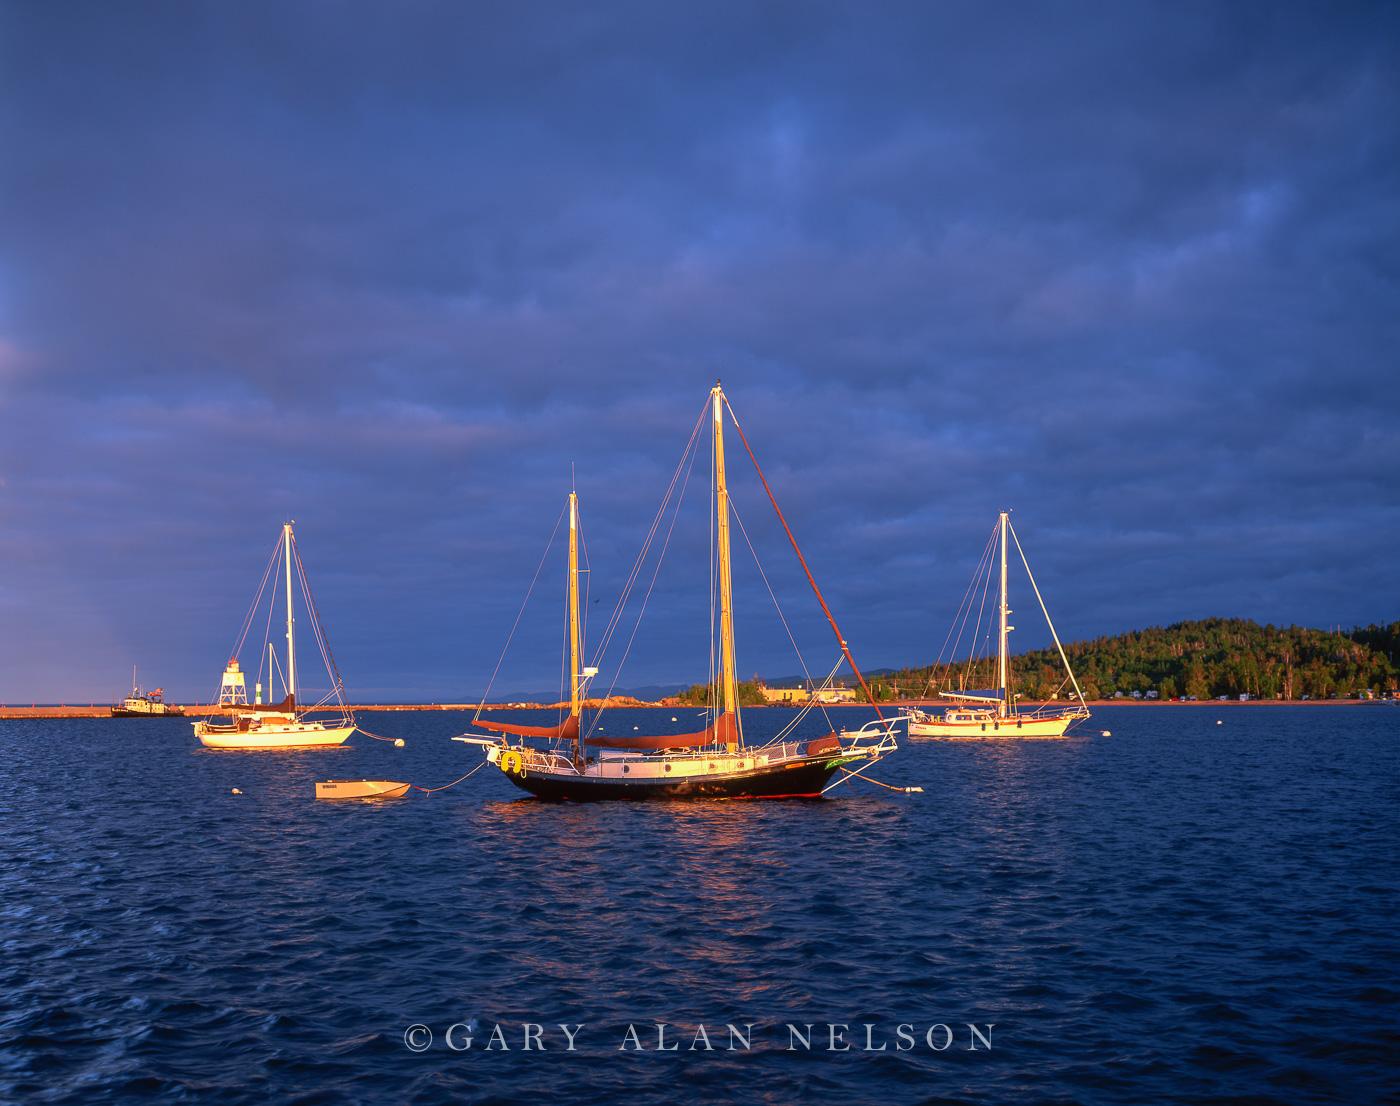 minnesota, lake superior, harbor, photo